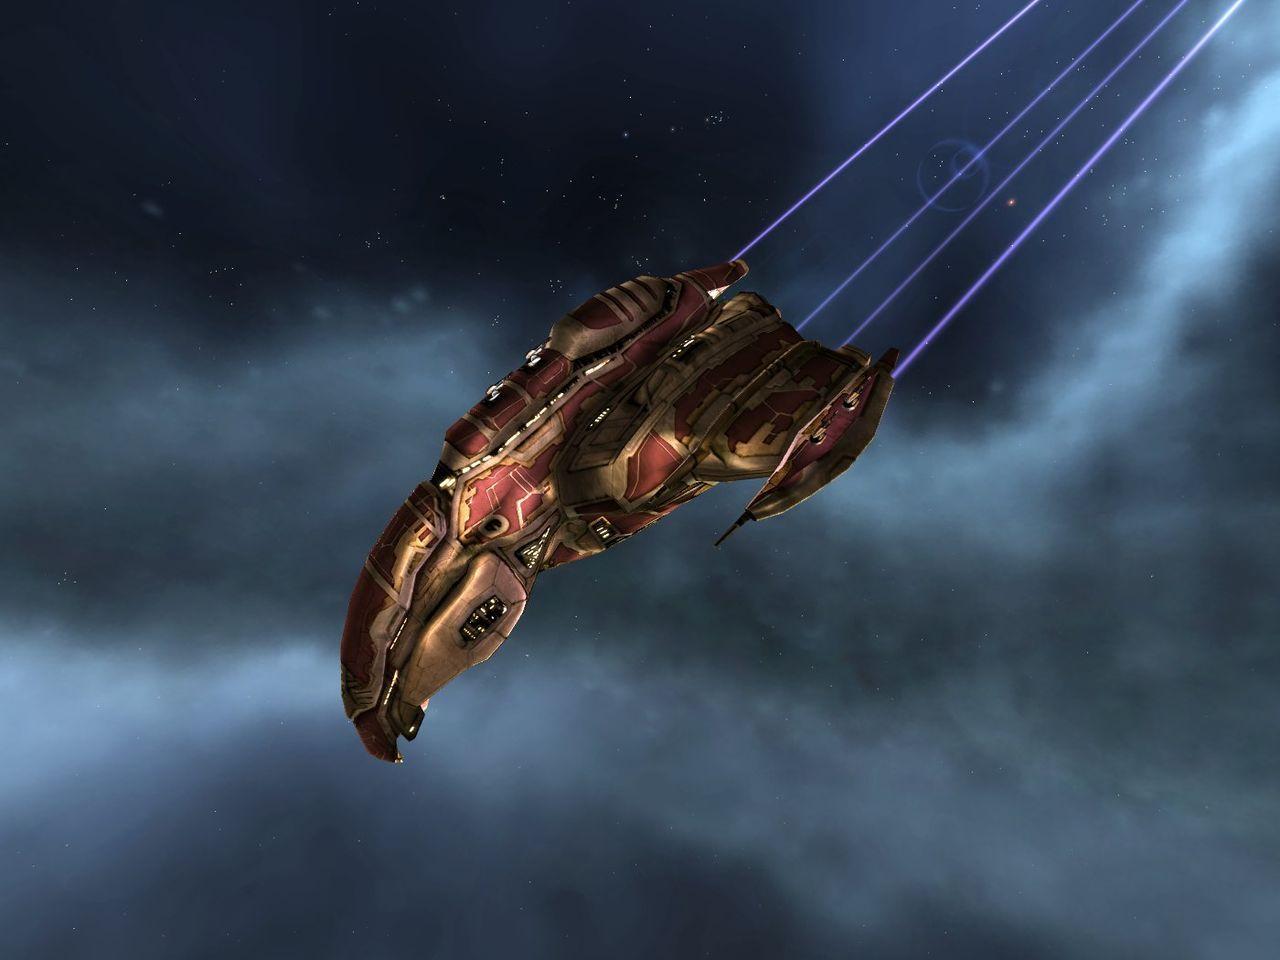 EVE Online (PC) Amarr-command-ship-absolution-3